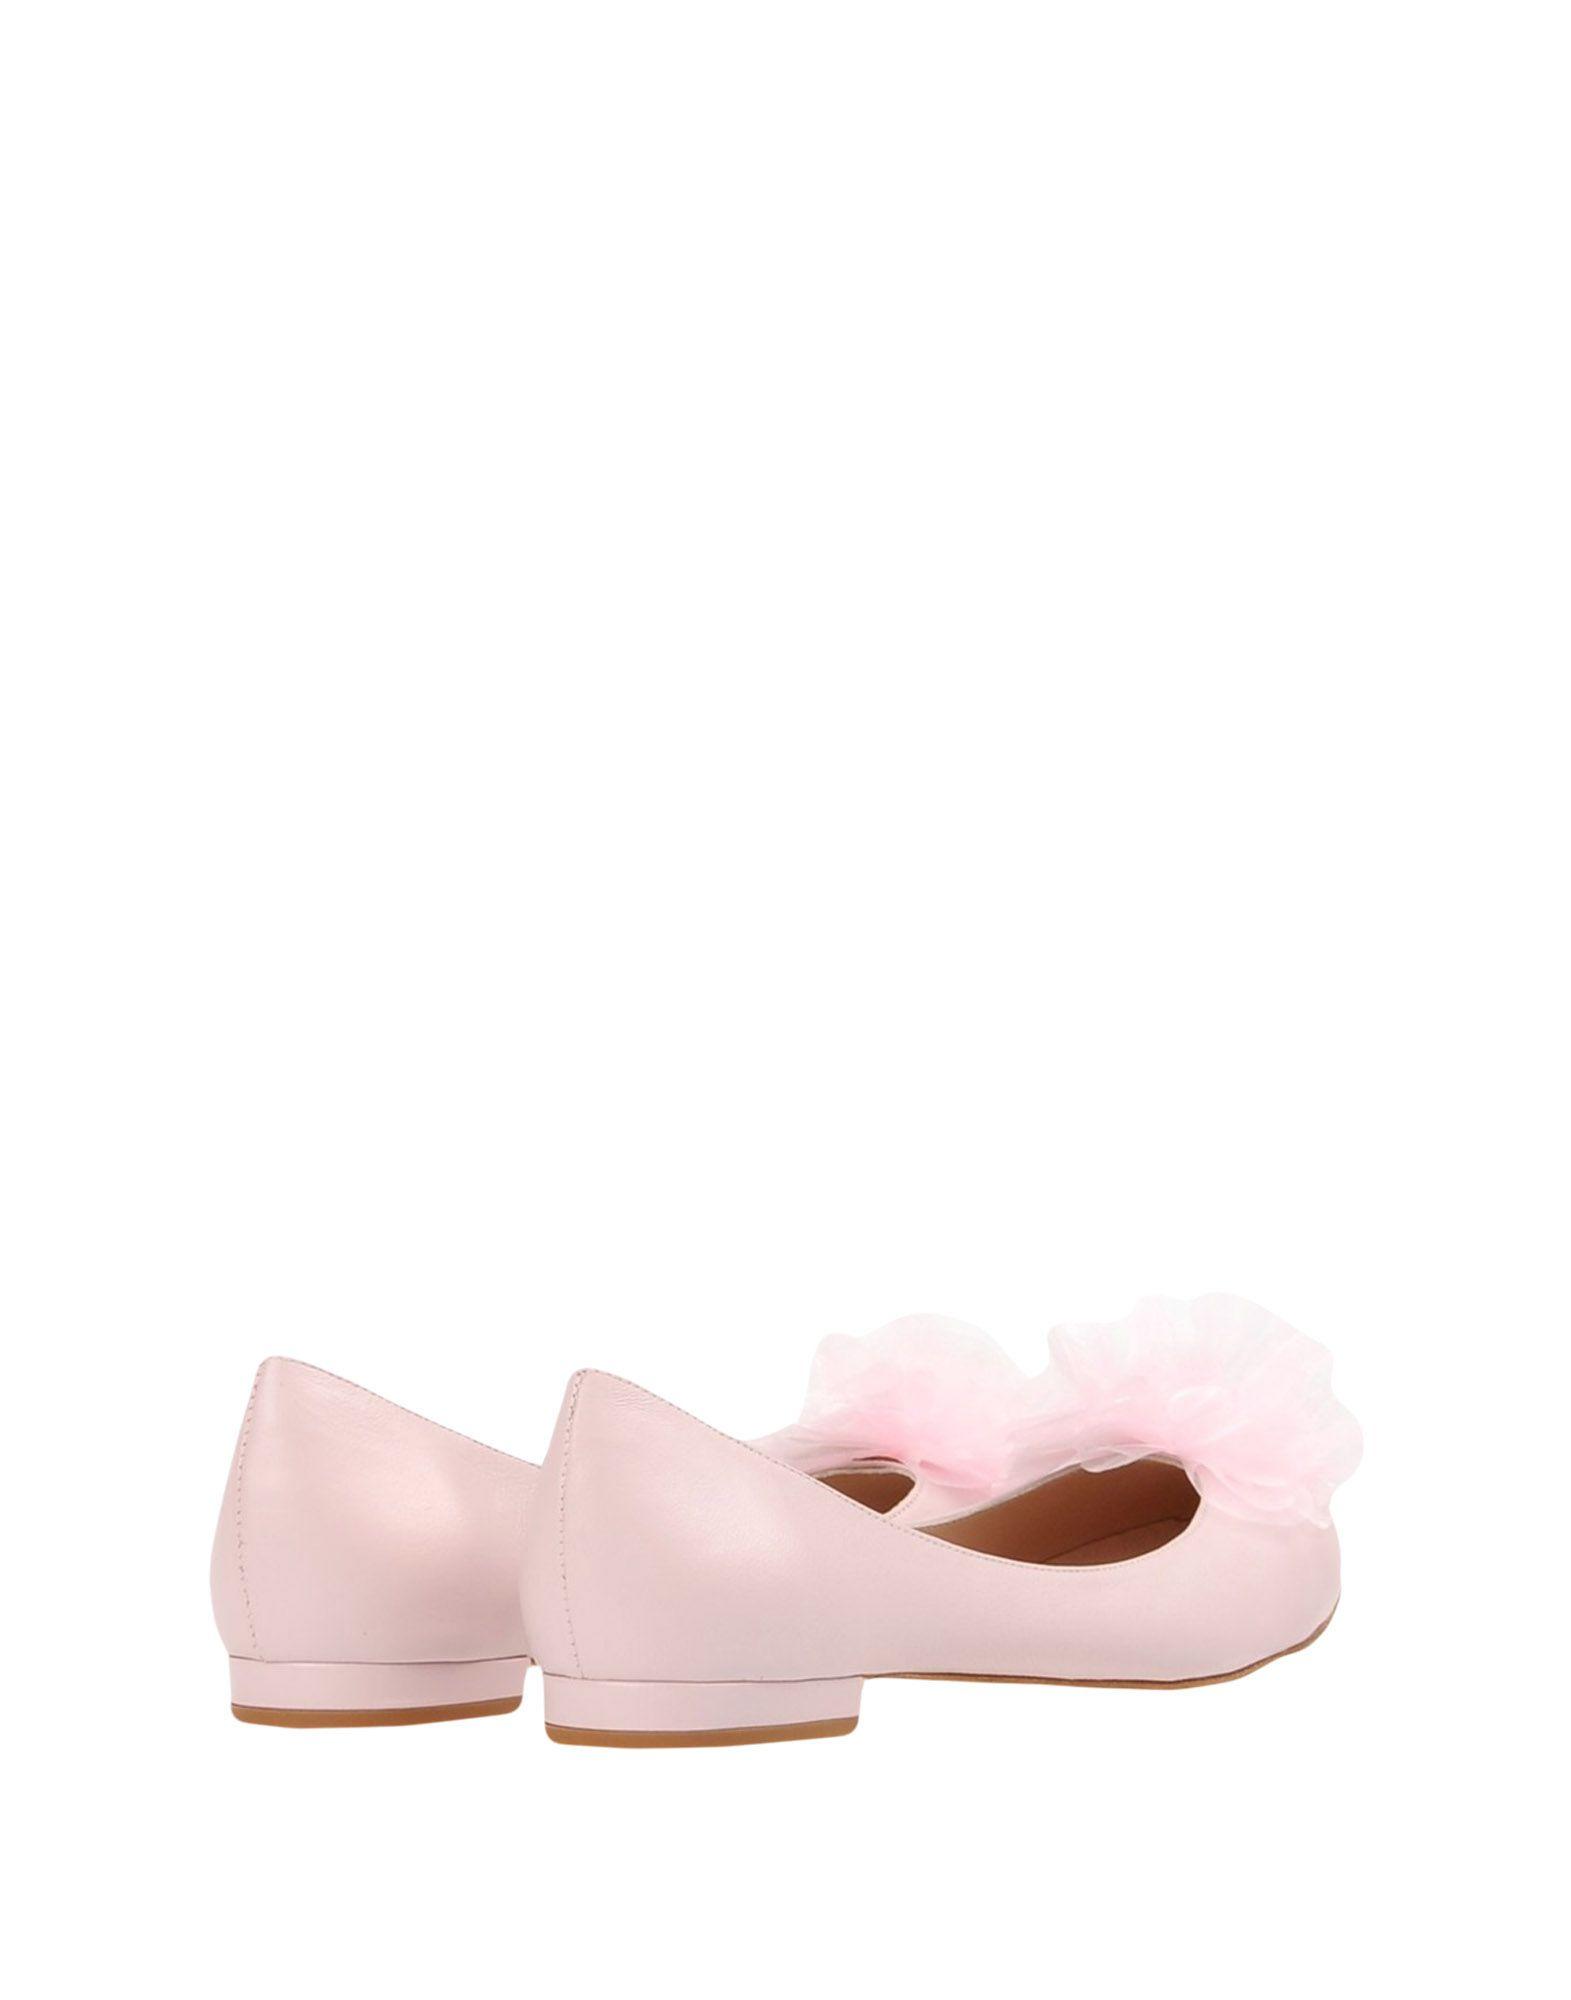 Savoy Ballerinas Schuhe Damen  11415043CC Gute Qualität beliebte Schuhe Ballerinas 21409e